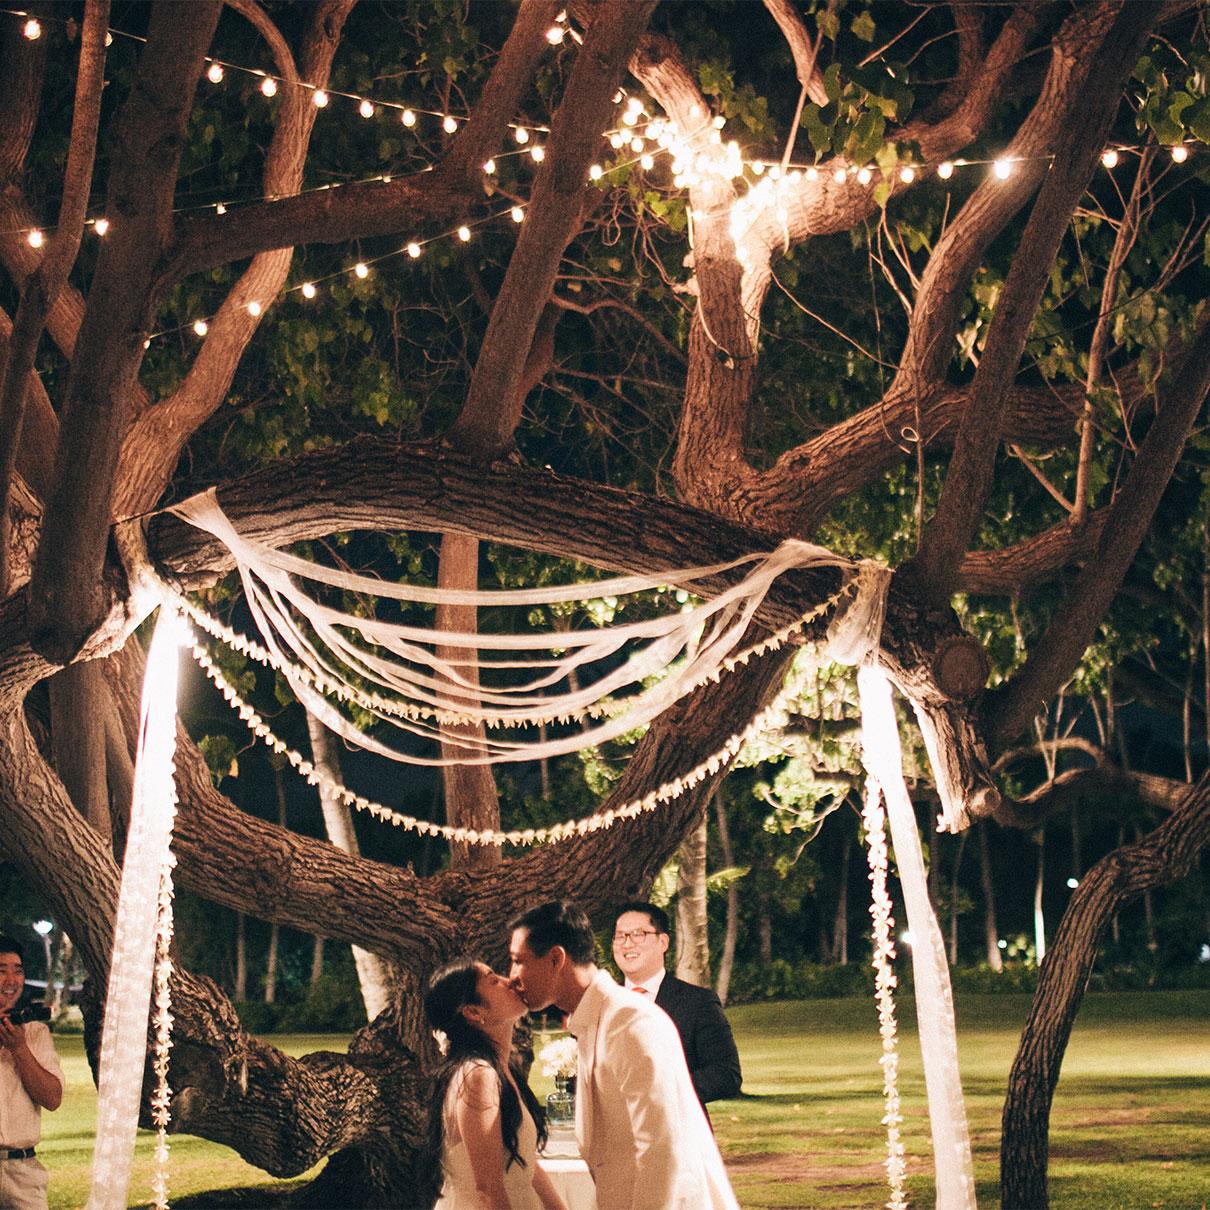 Hawaii Destination Wedding.Hawaii Destination Wedding Nighttime Ceremony Mango Muse Events